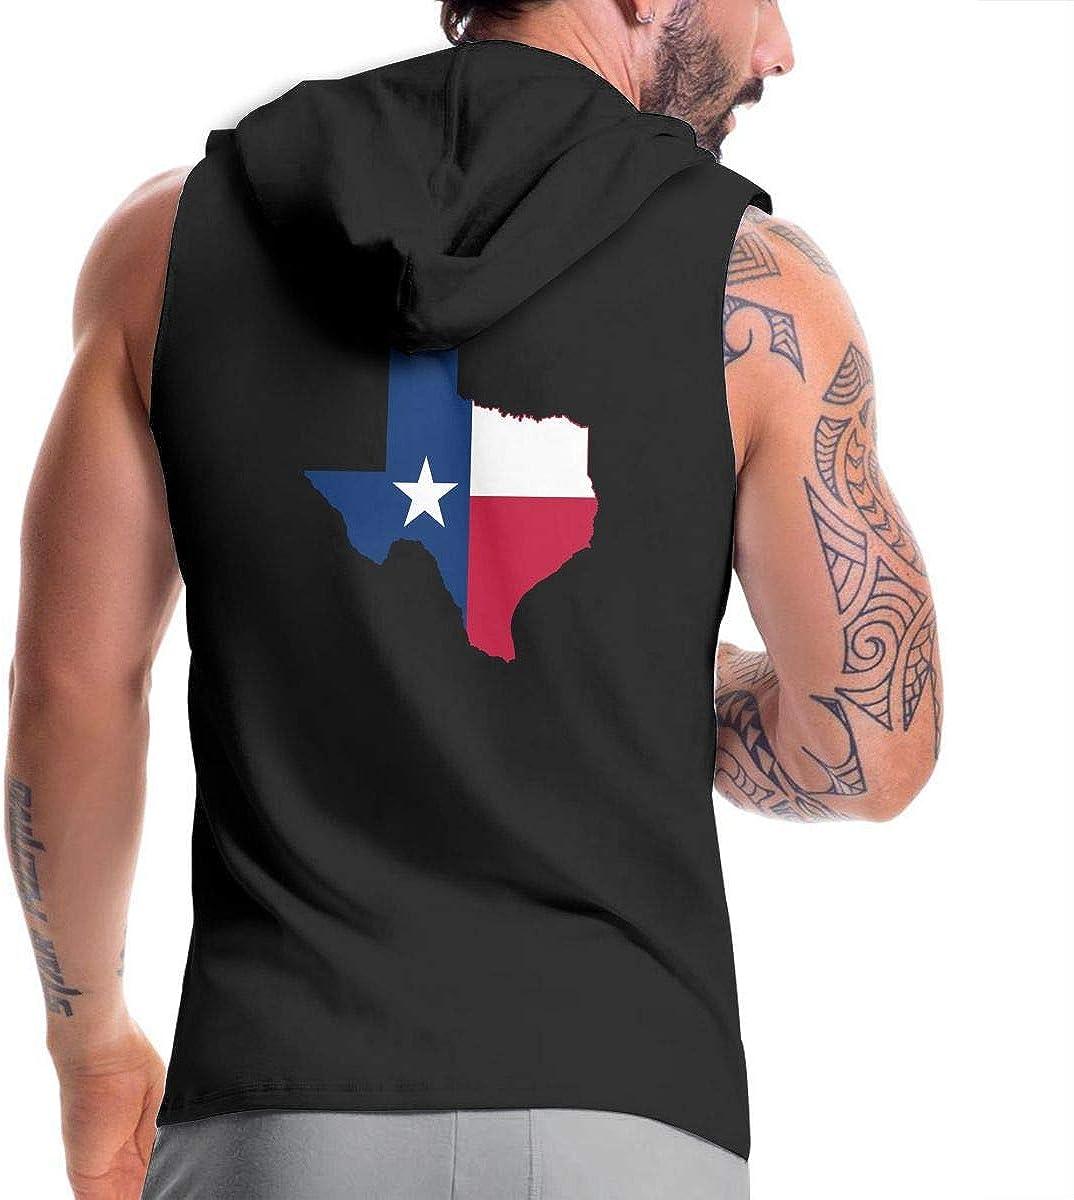 BB/&YYY Texas Lone Star State Mens Sleeveless Zipper Fleece Hoodie Lifting Vest Tank